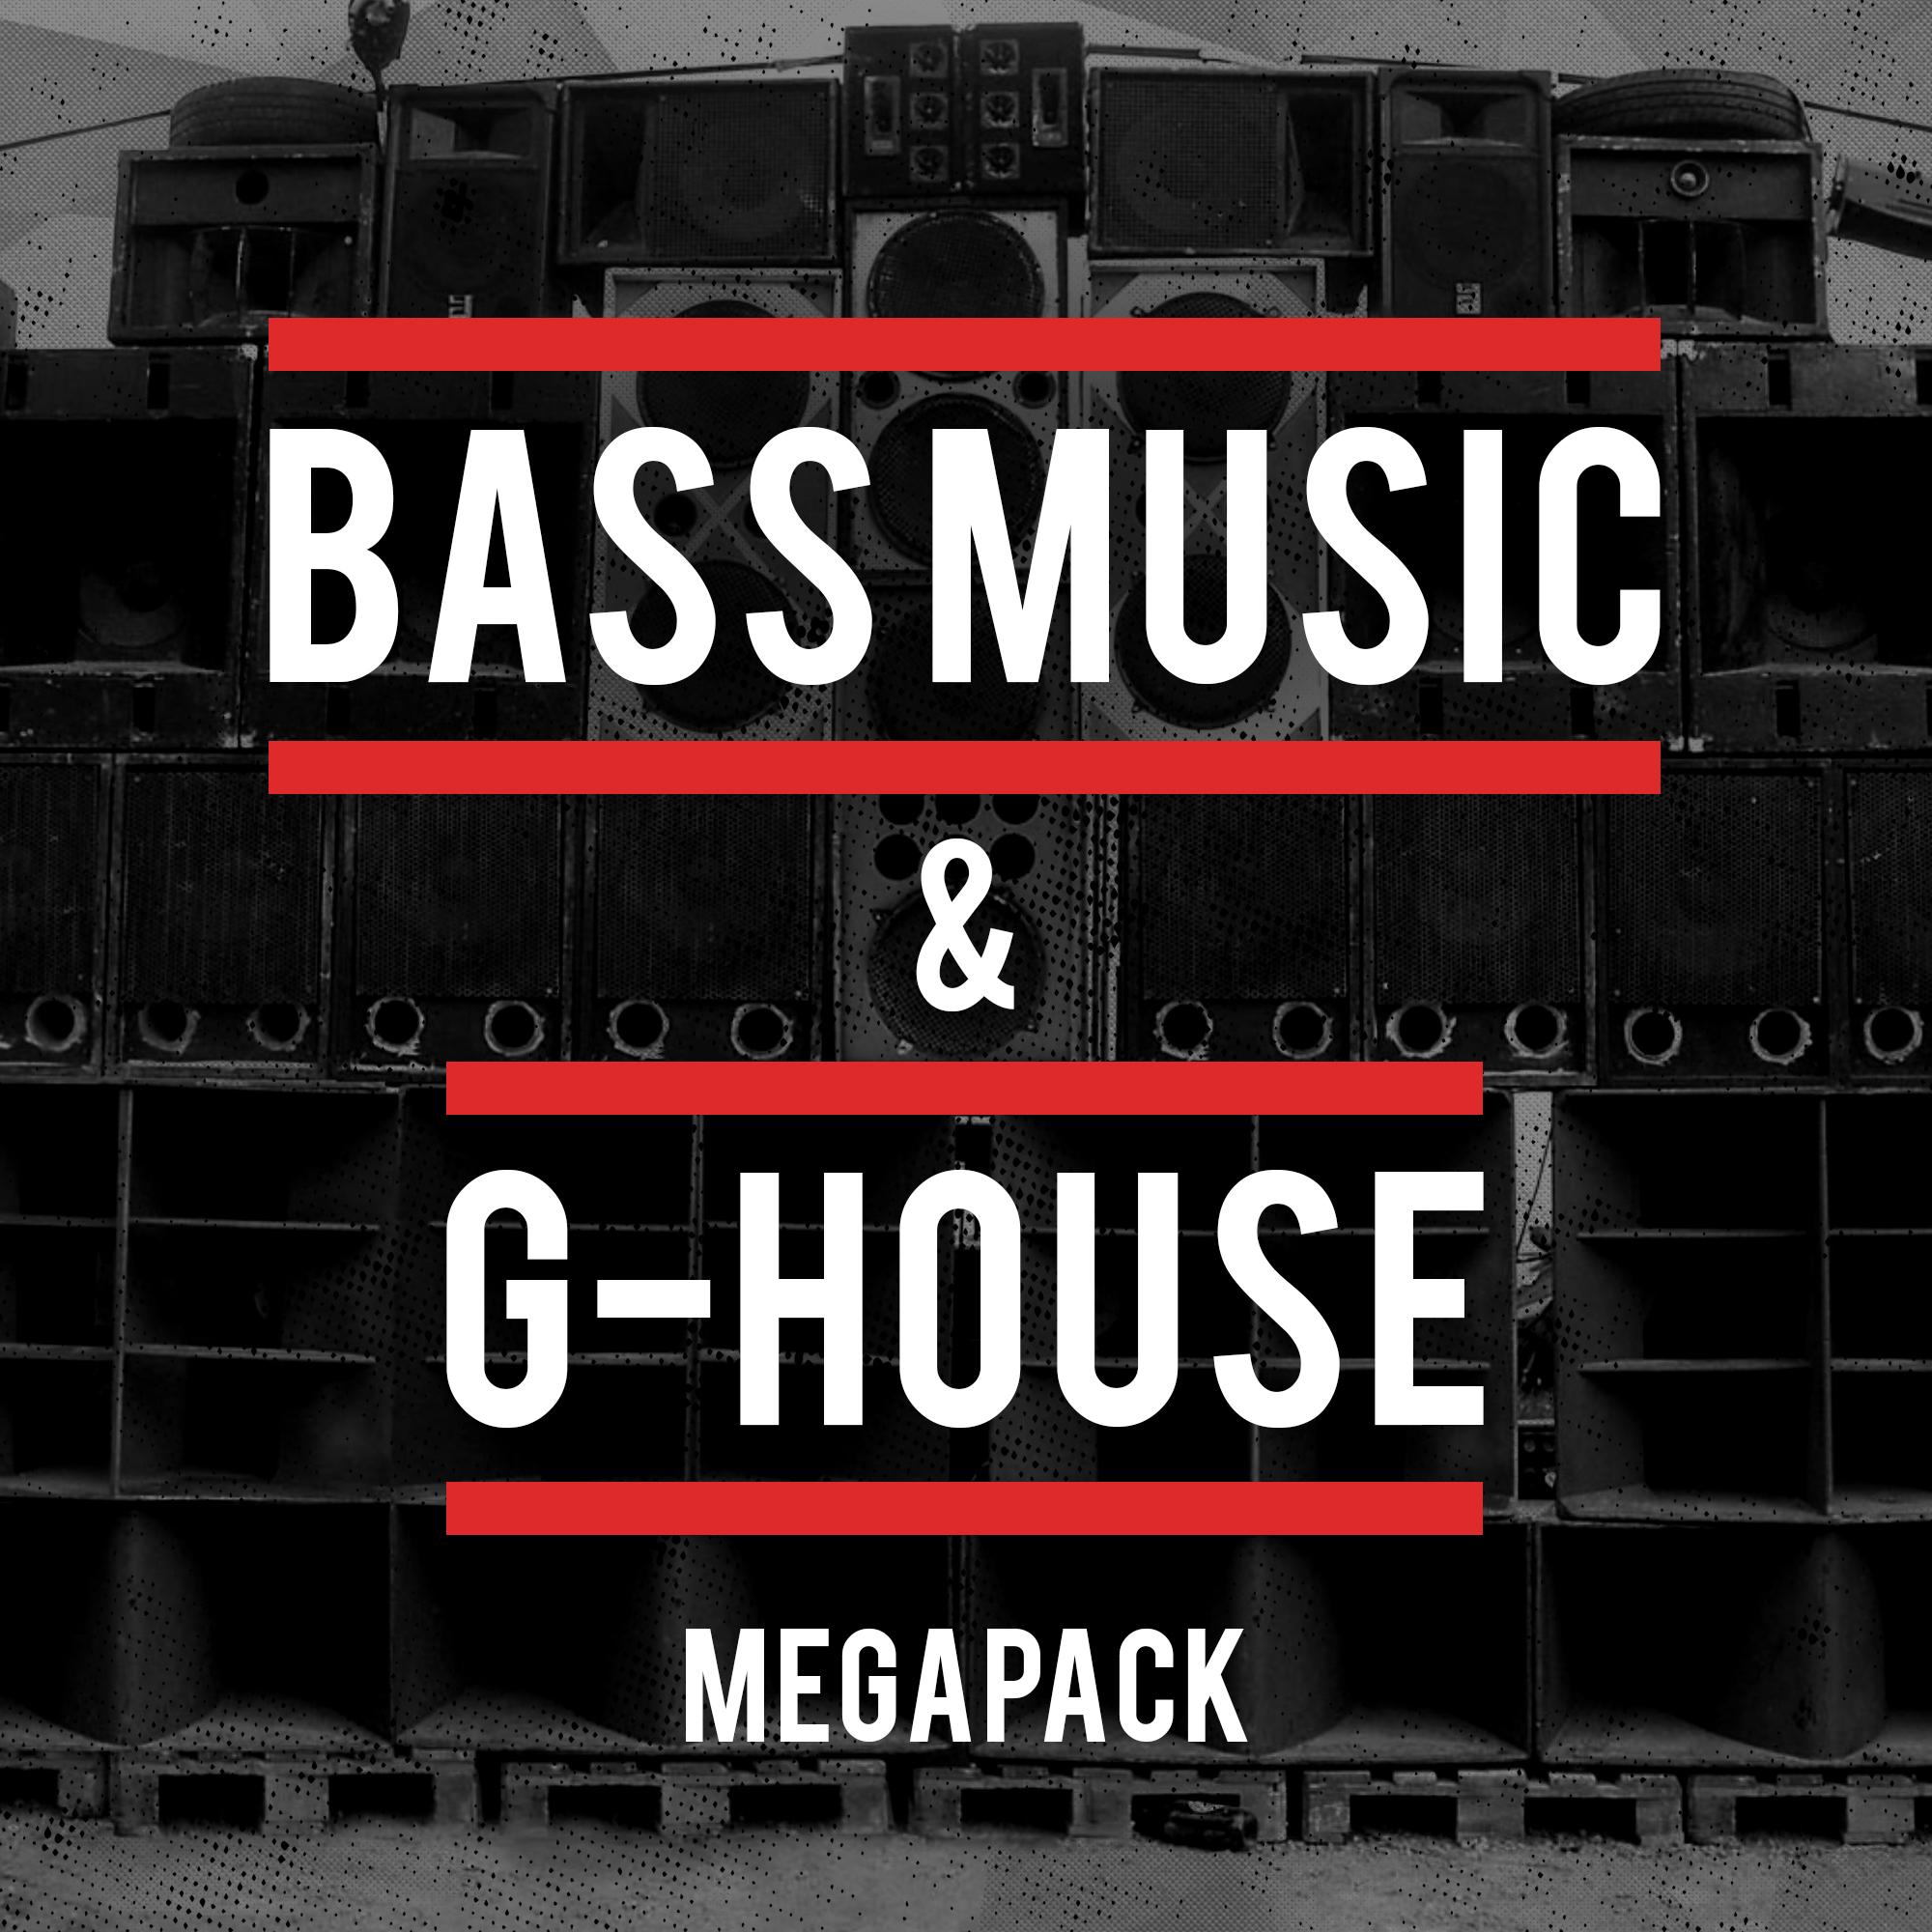 Bass Music & G-House Megapack